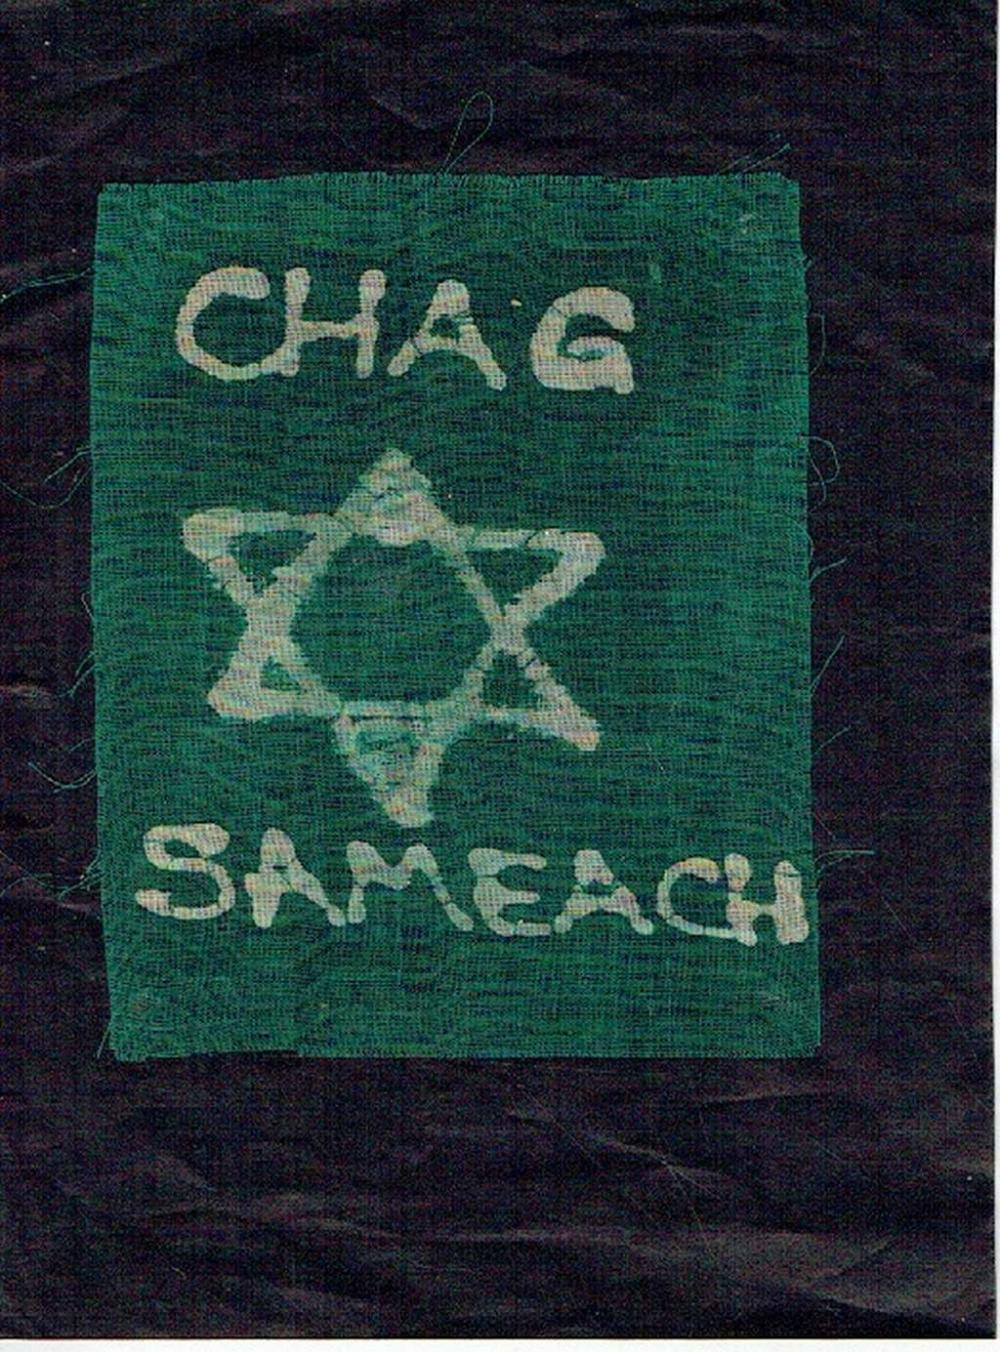 She'erit Ha-Pleita. Jewish DP camp. Magen David and inscription In Hebrew: Chag sameach - Drawing on green cloth.